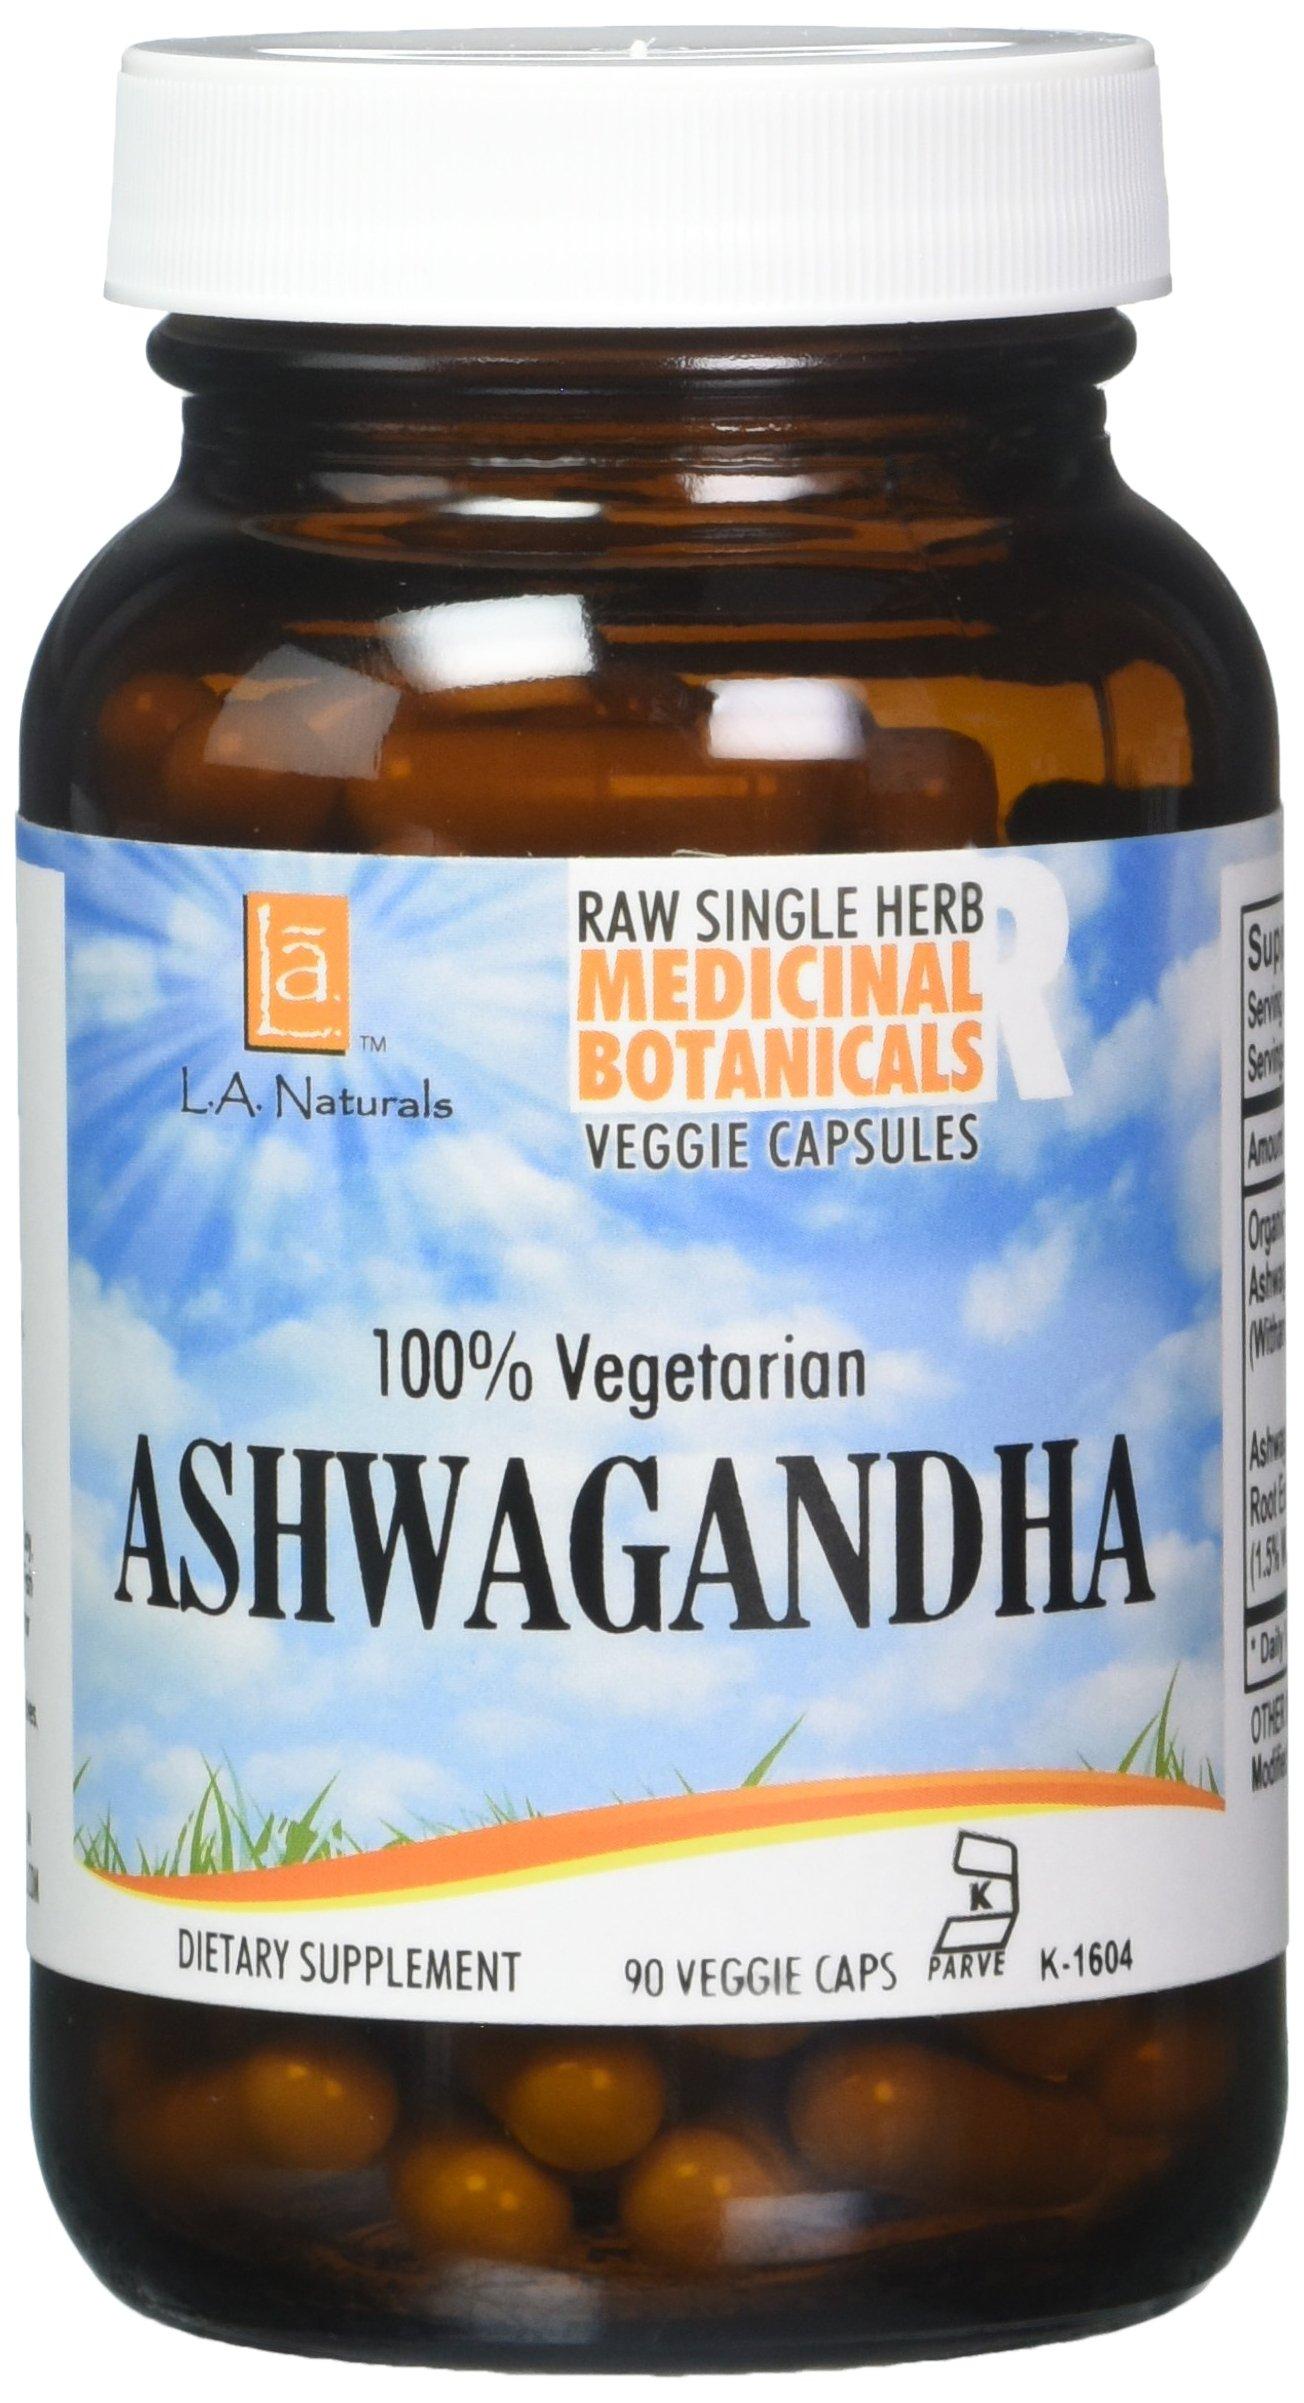 L A NATURALS Ashwagandha 90 Vgc, 0.02 Pound